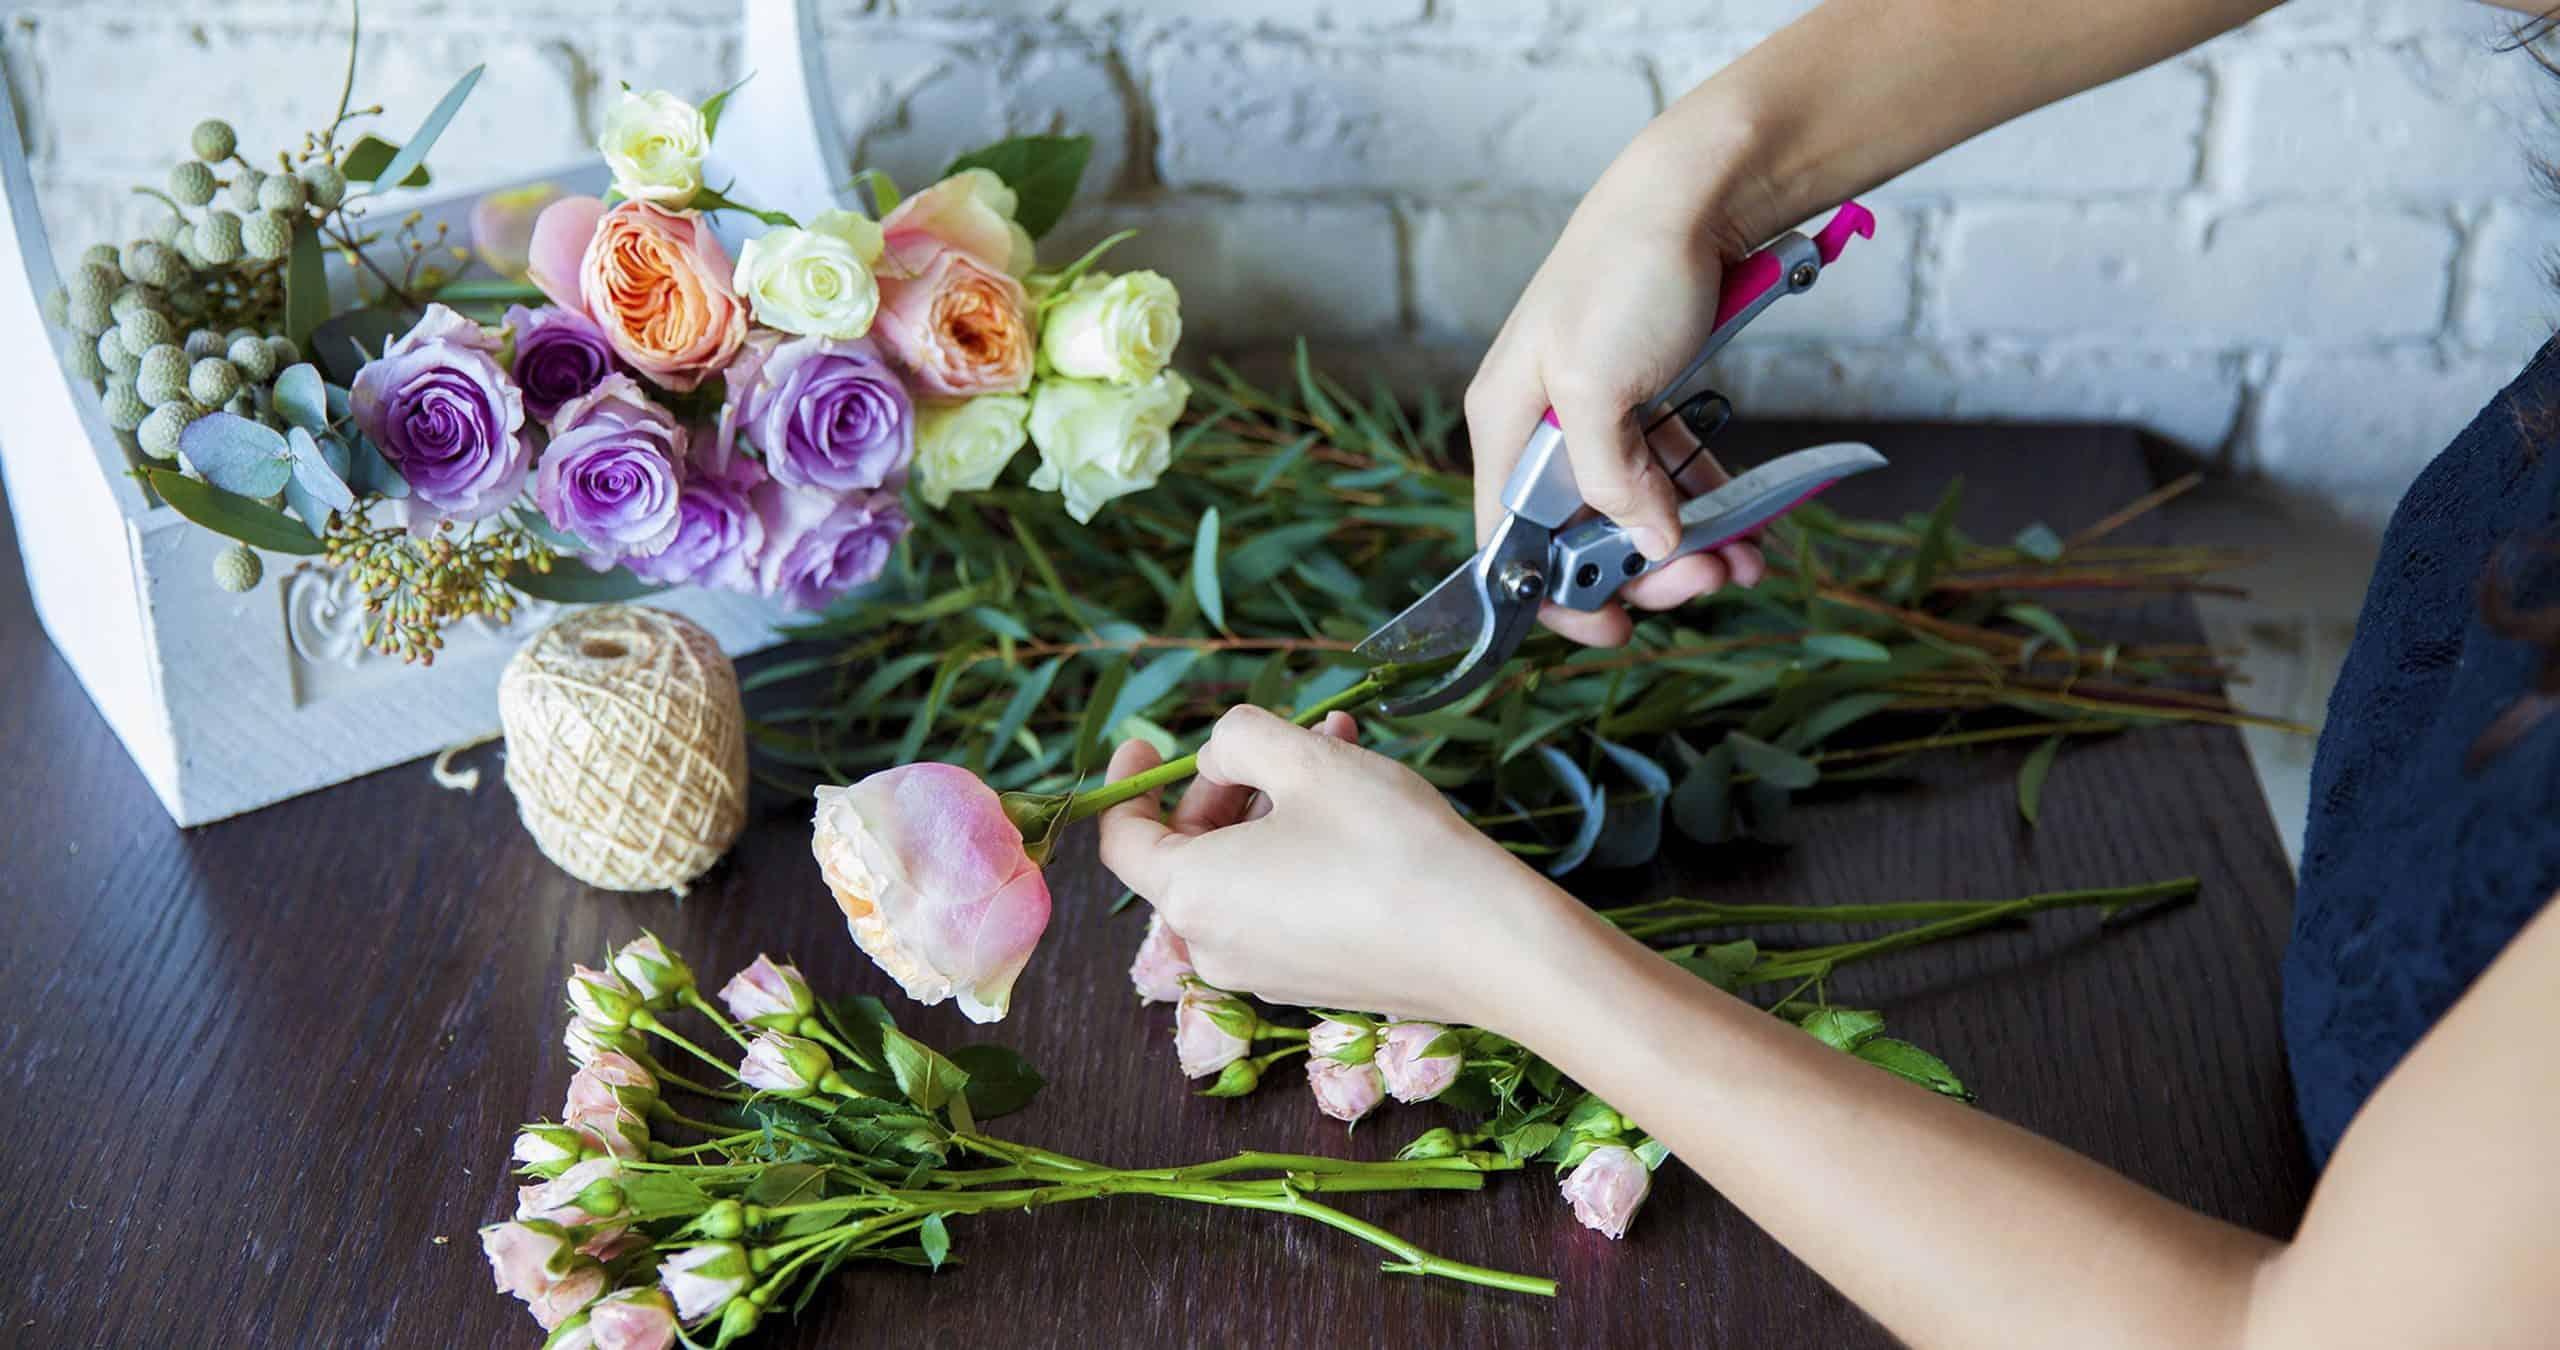 prepared a wedding bouquet